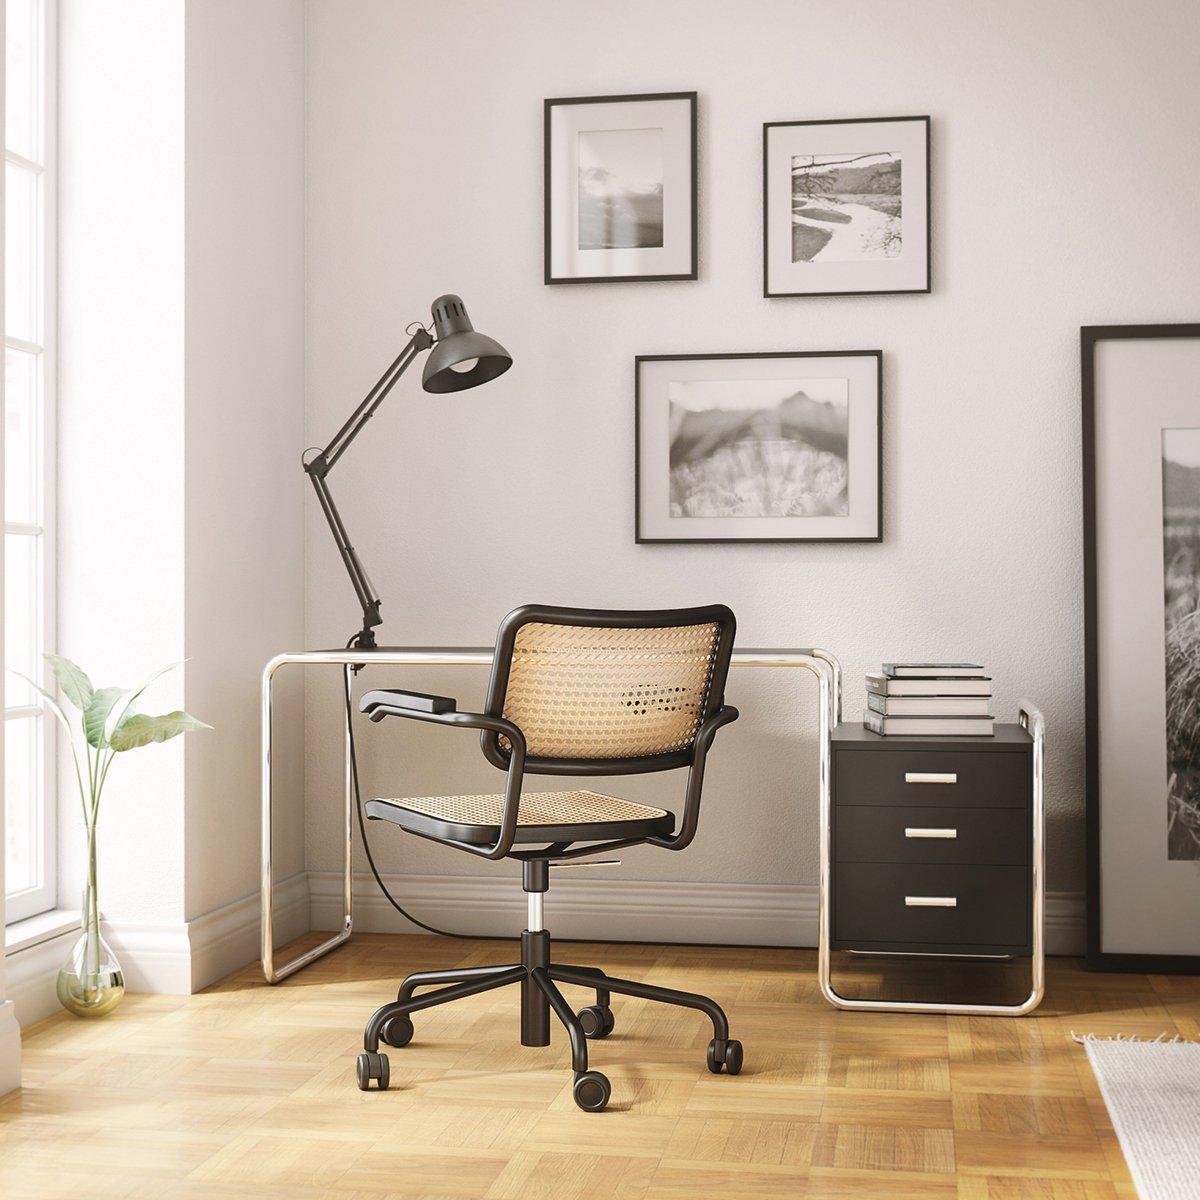 Thonet S285 Bureau & S64 VDR Bureaustoel Thuiswerkplek